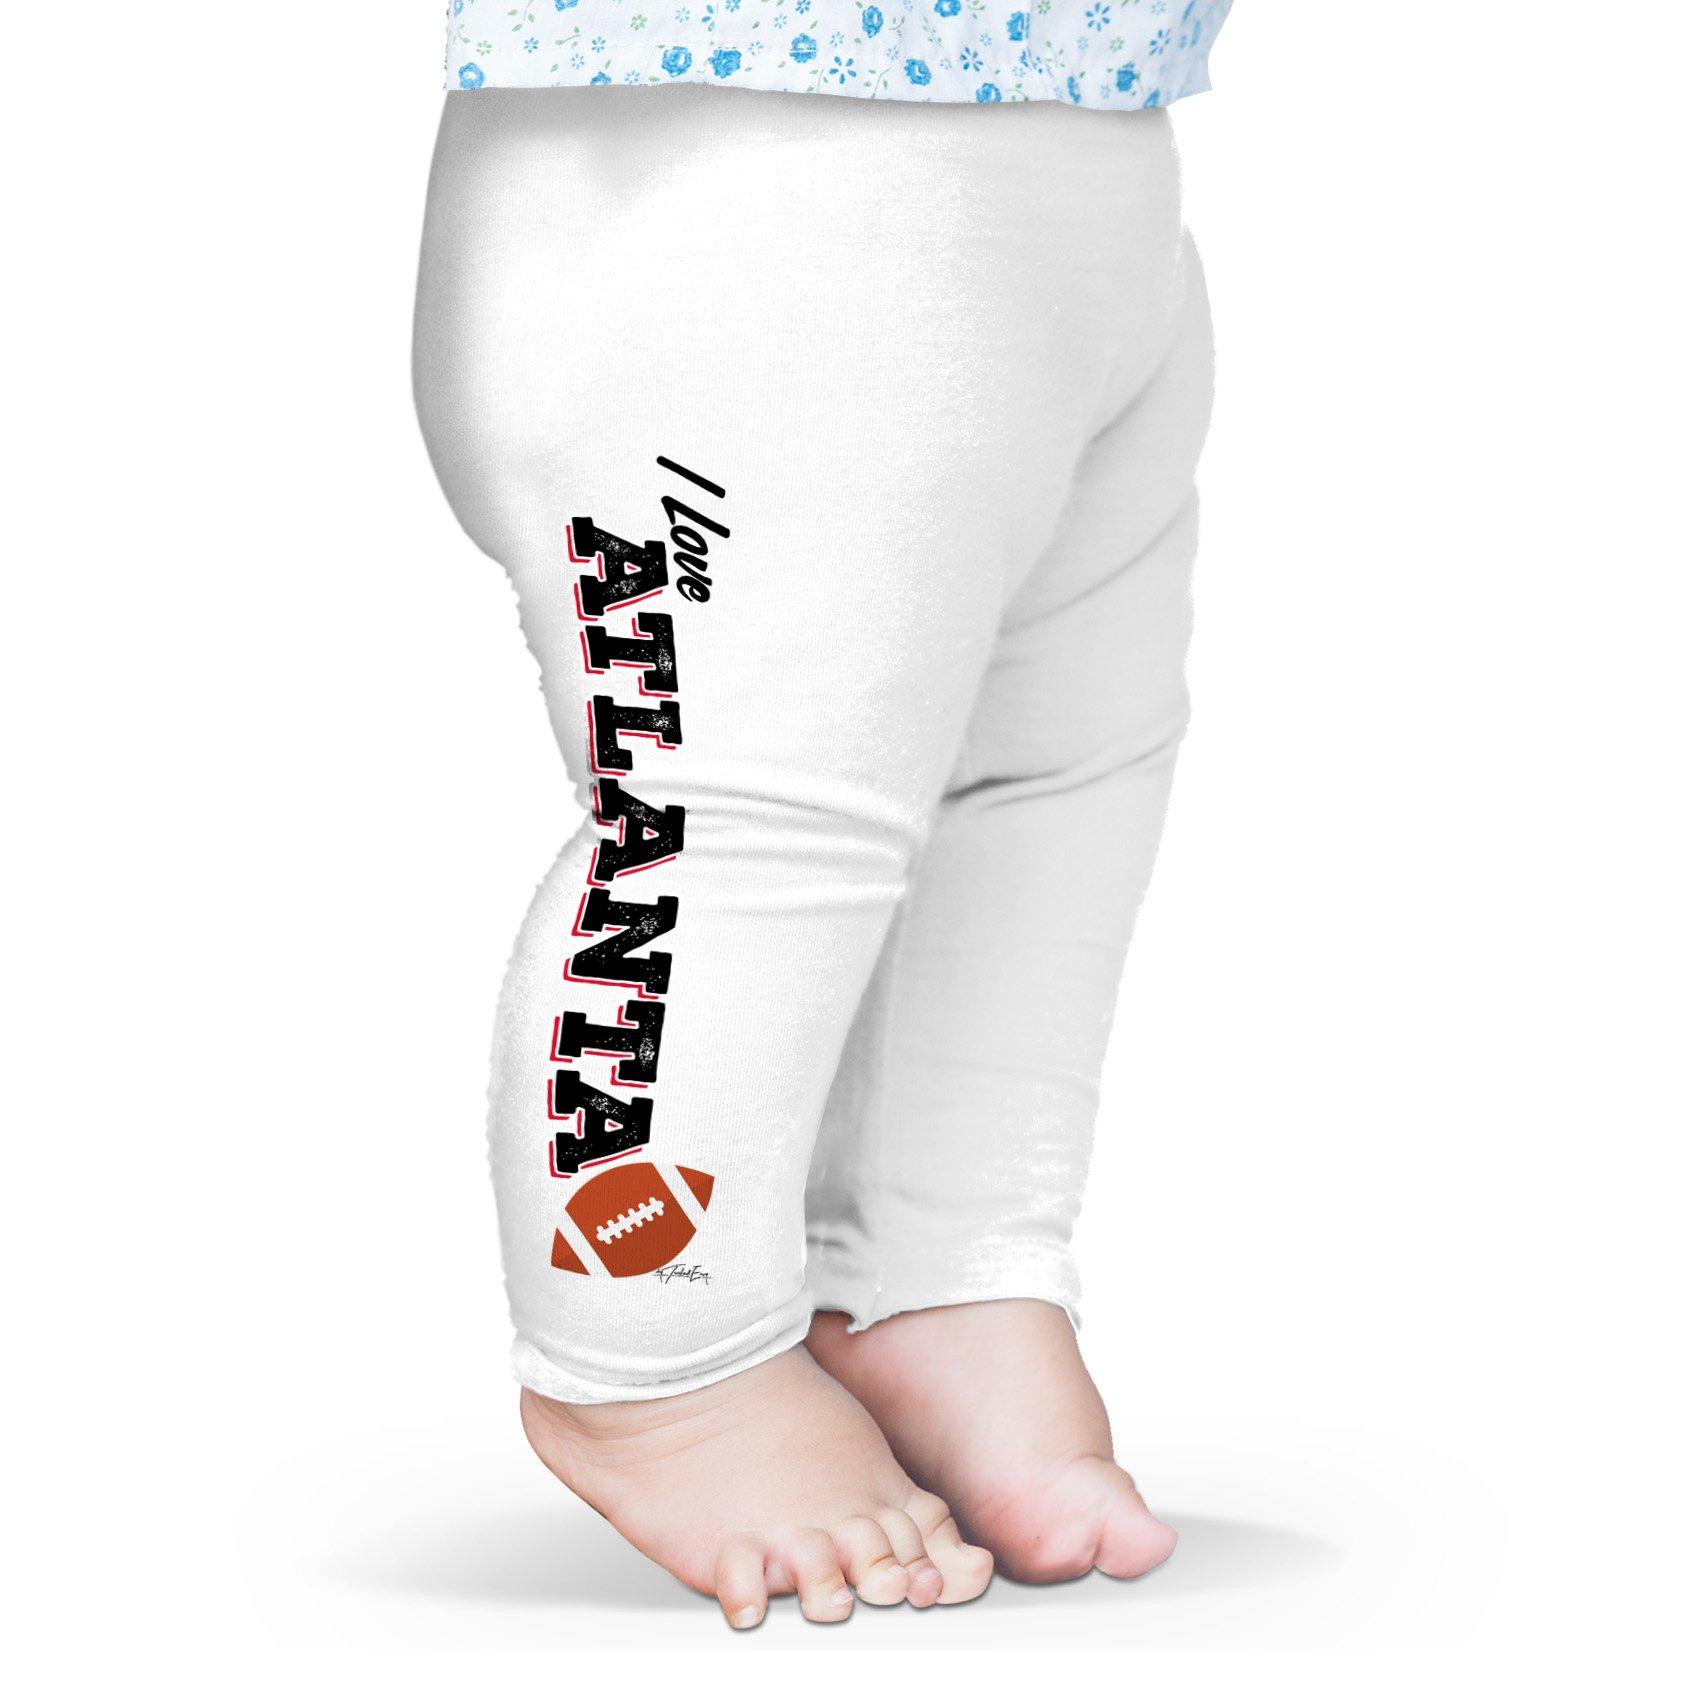 Twisted Envy Baby I Love Atlanta American Football Leggings Trousers 6-12 Months White